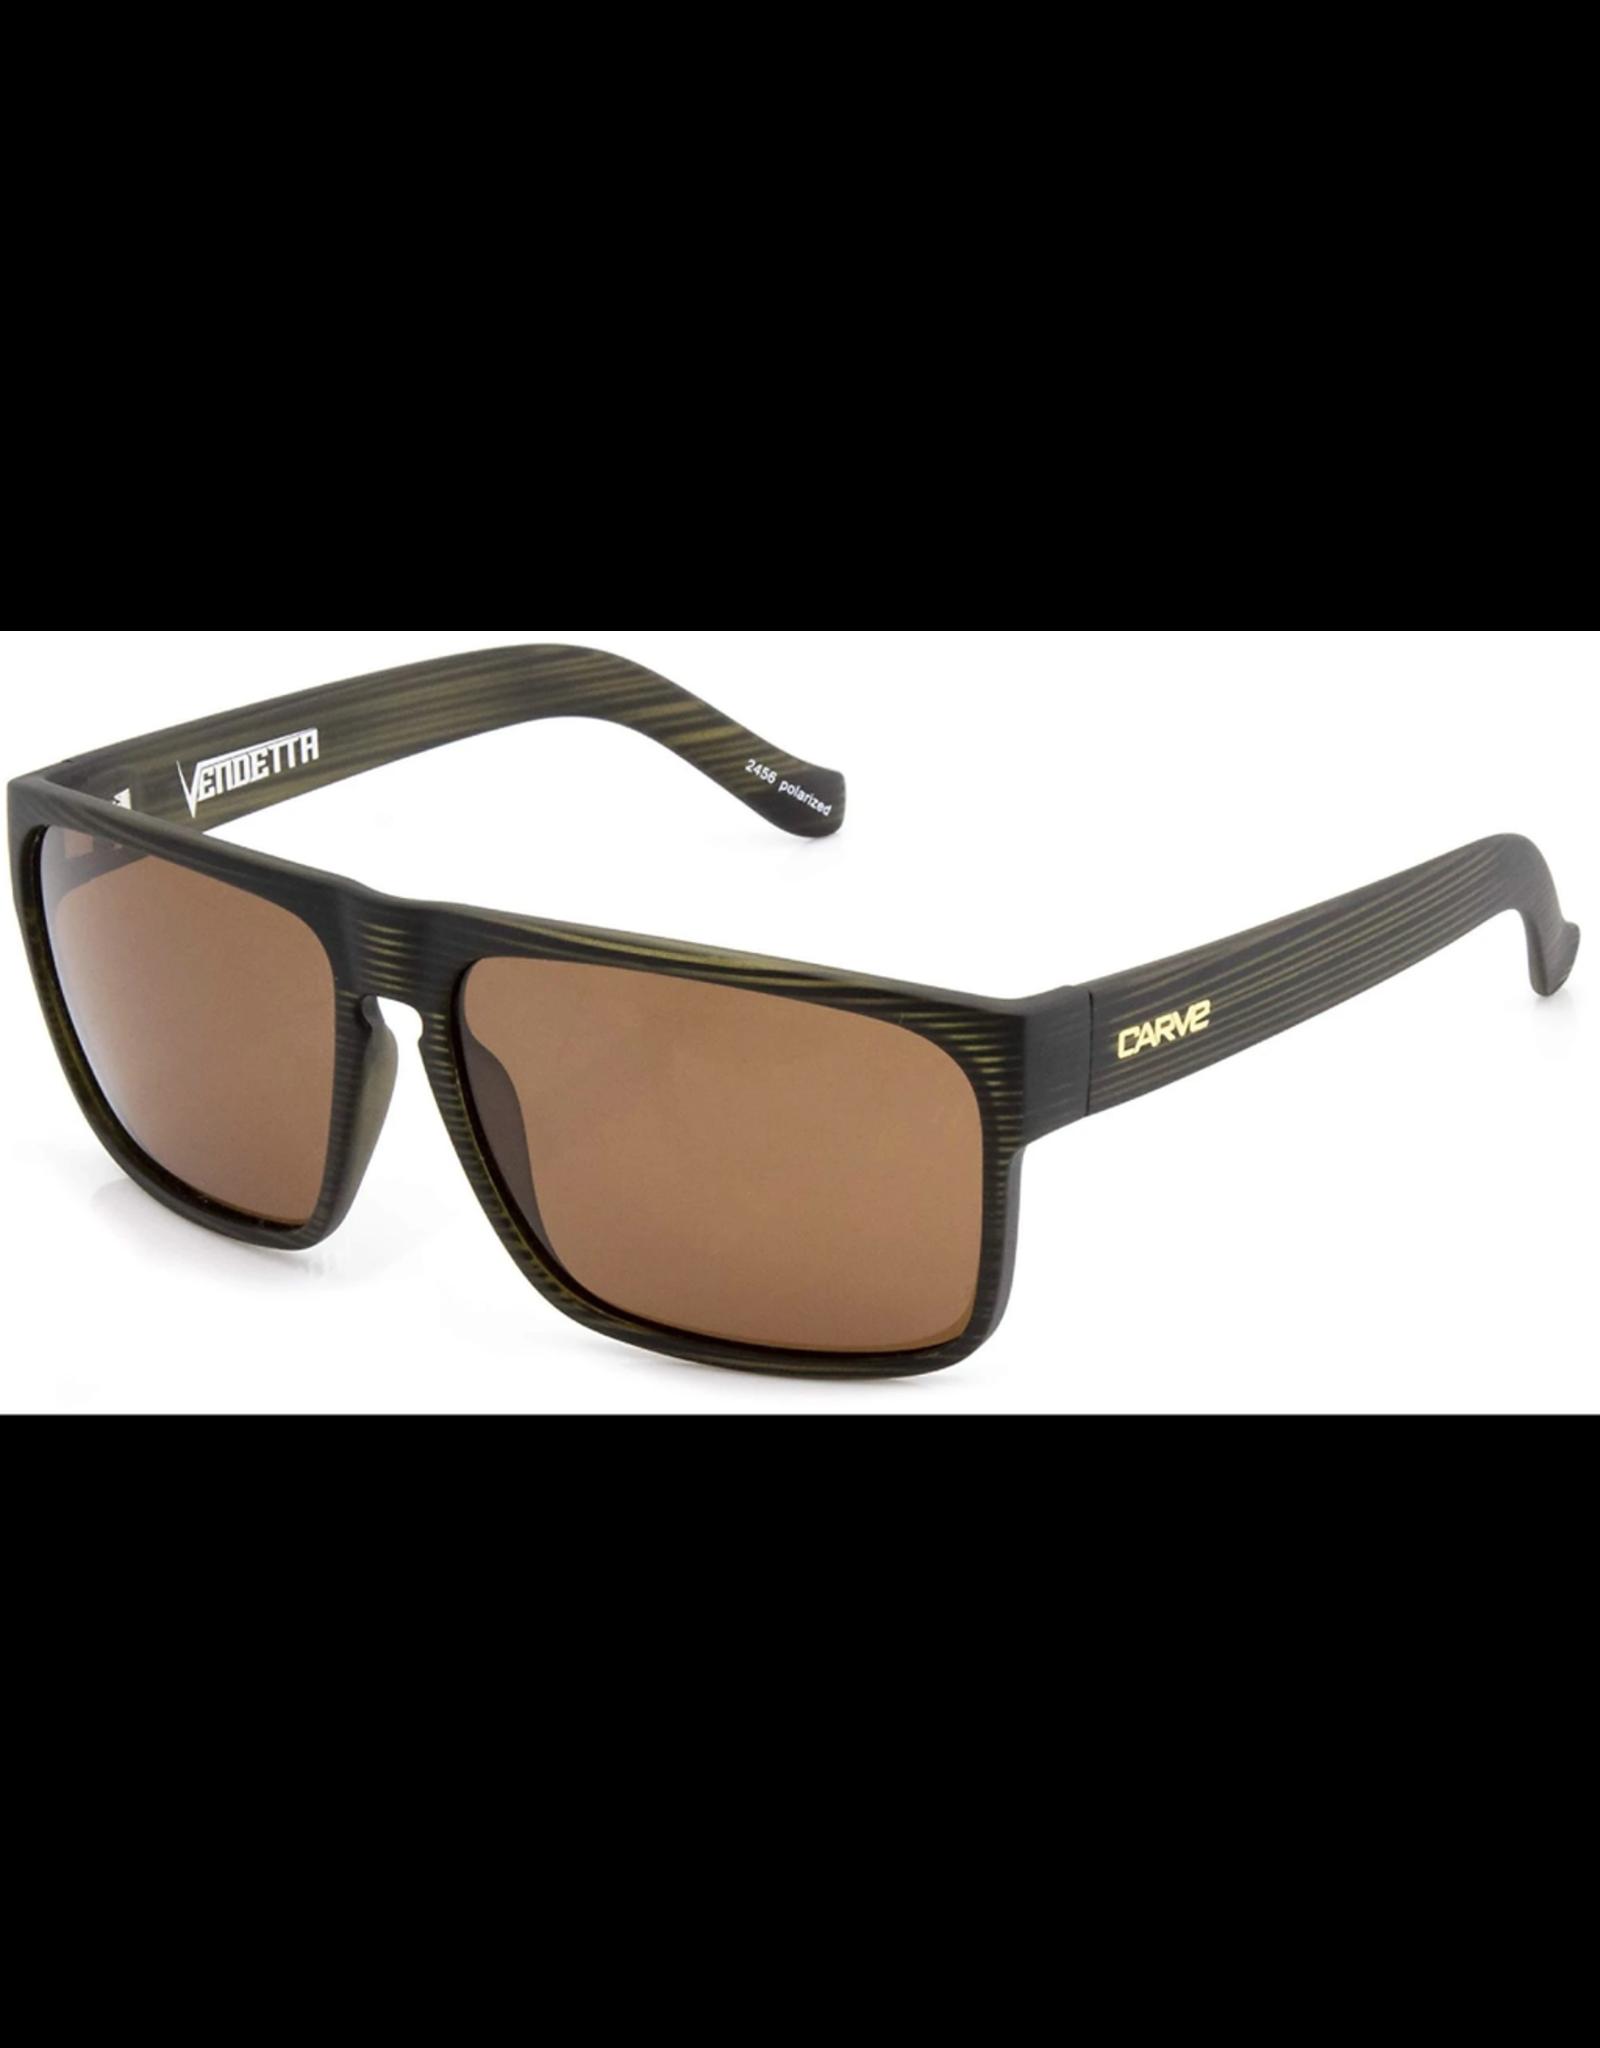 CARVE SUNGLASSES CARVE VENDETTA Polarized Sunglasses